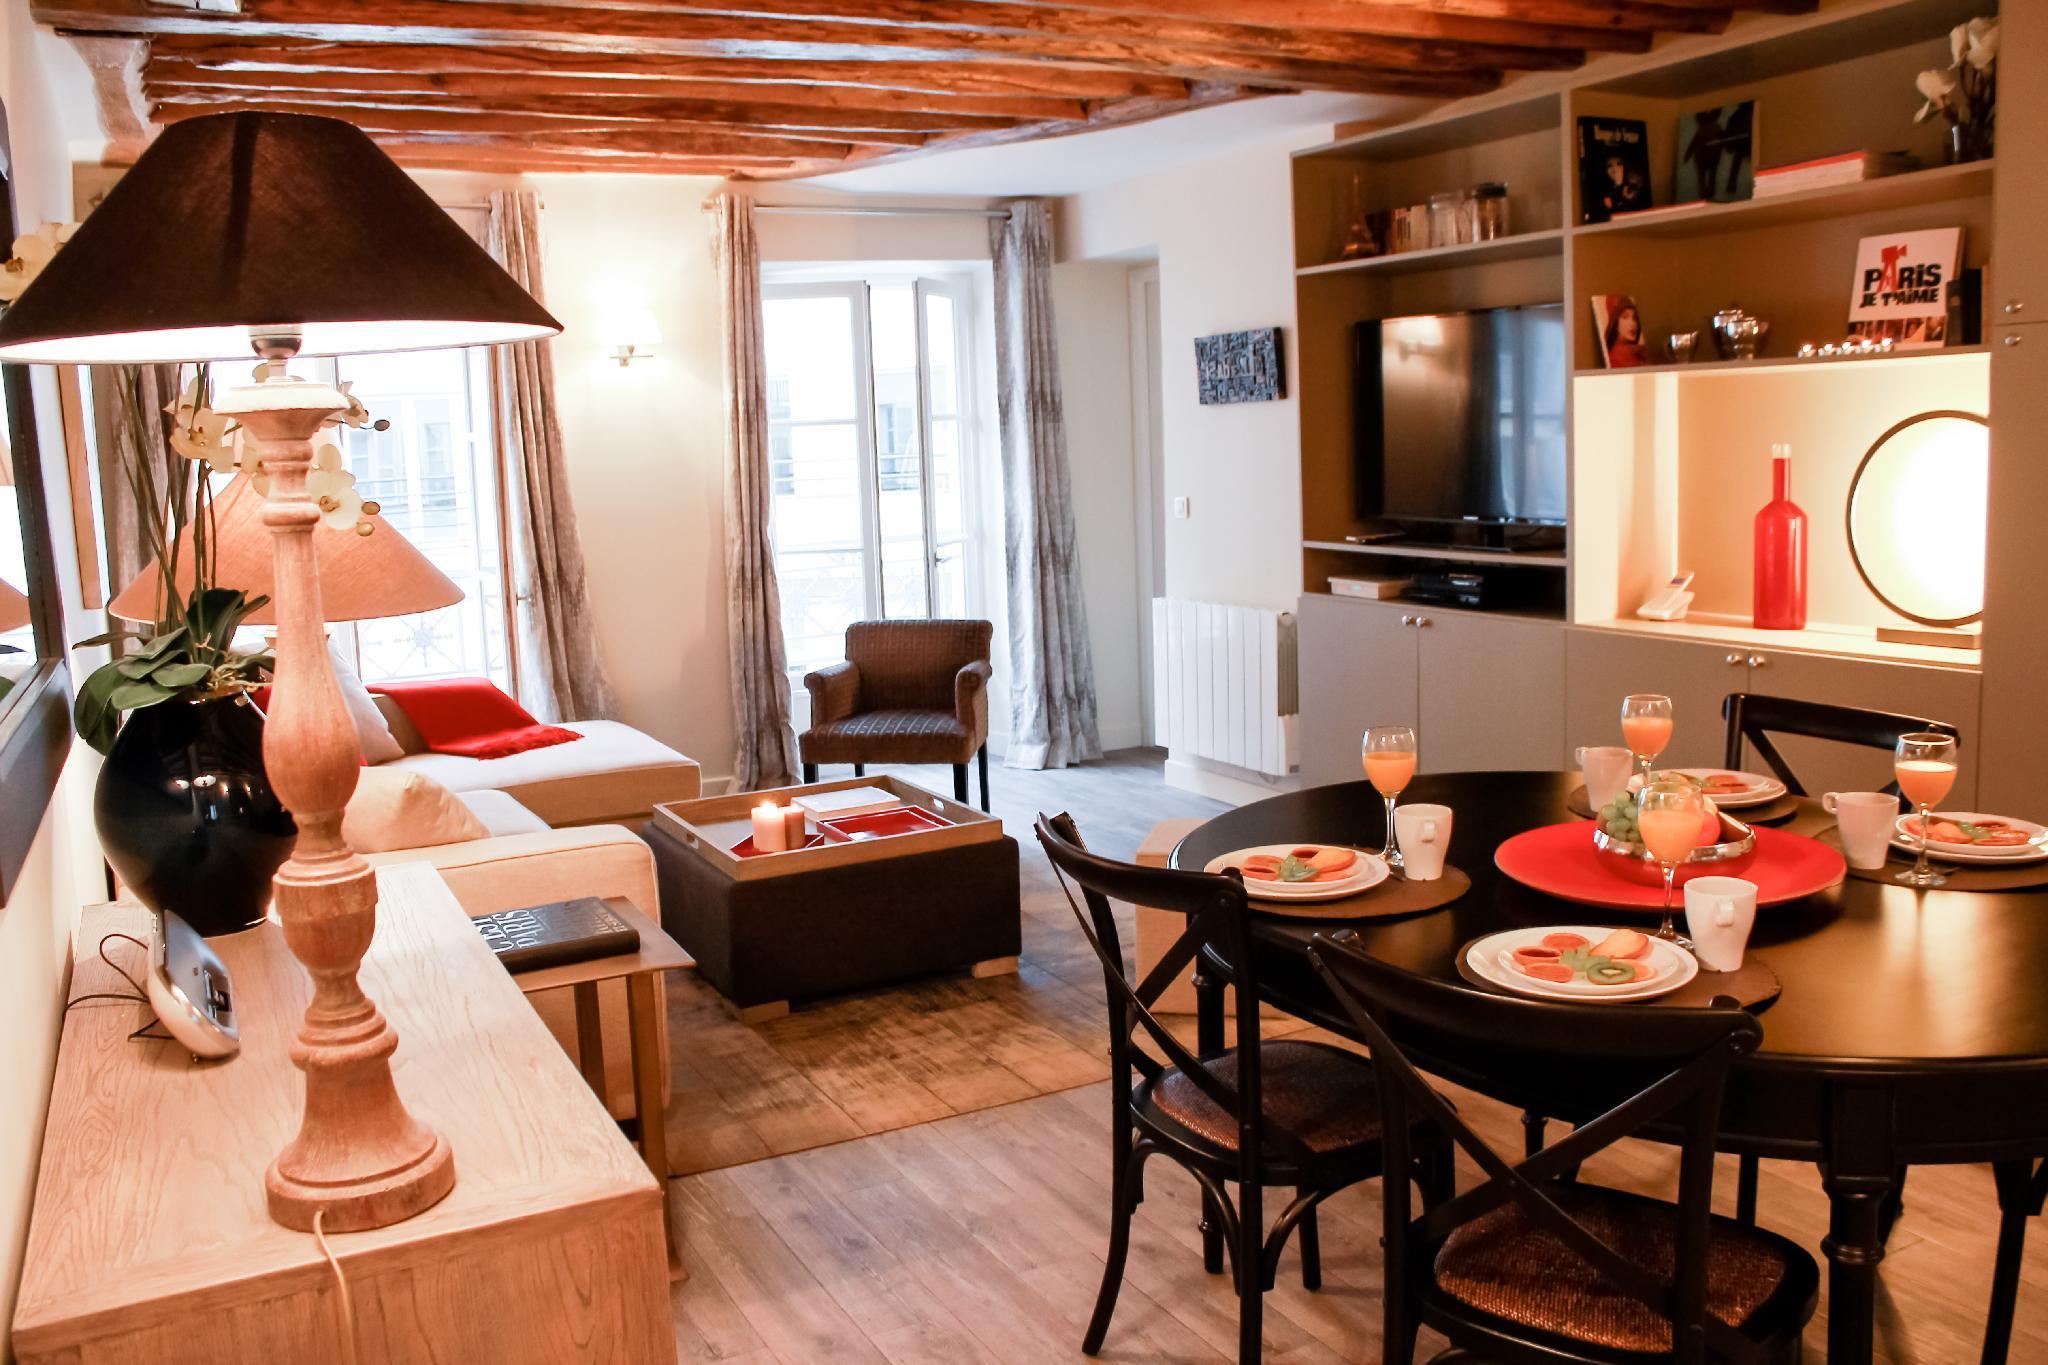 207540 - Appartement 6 personnes Rue Cler